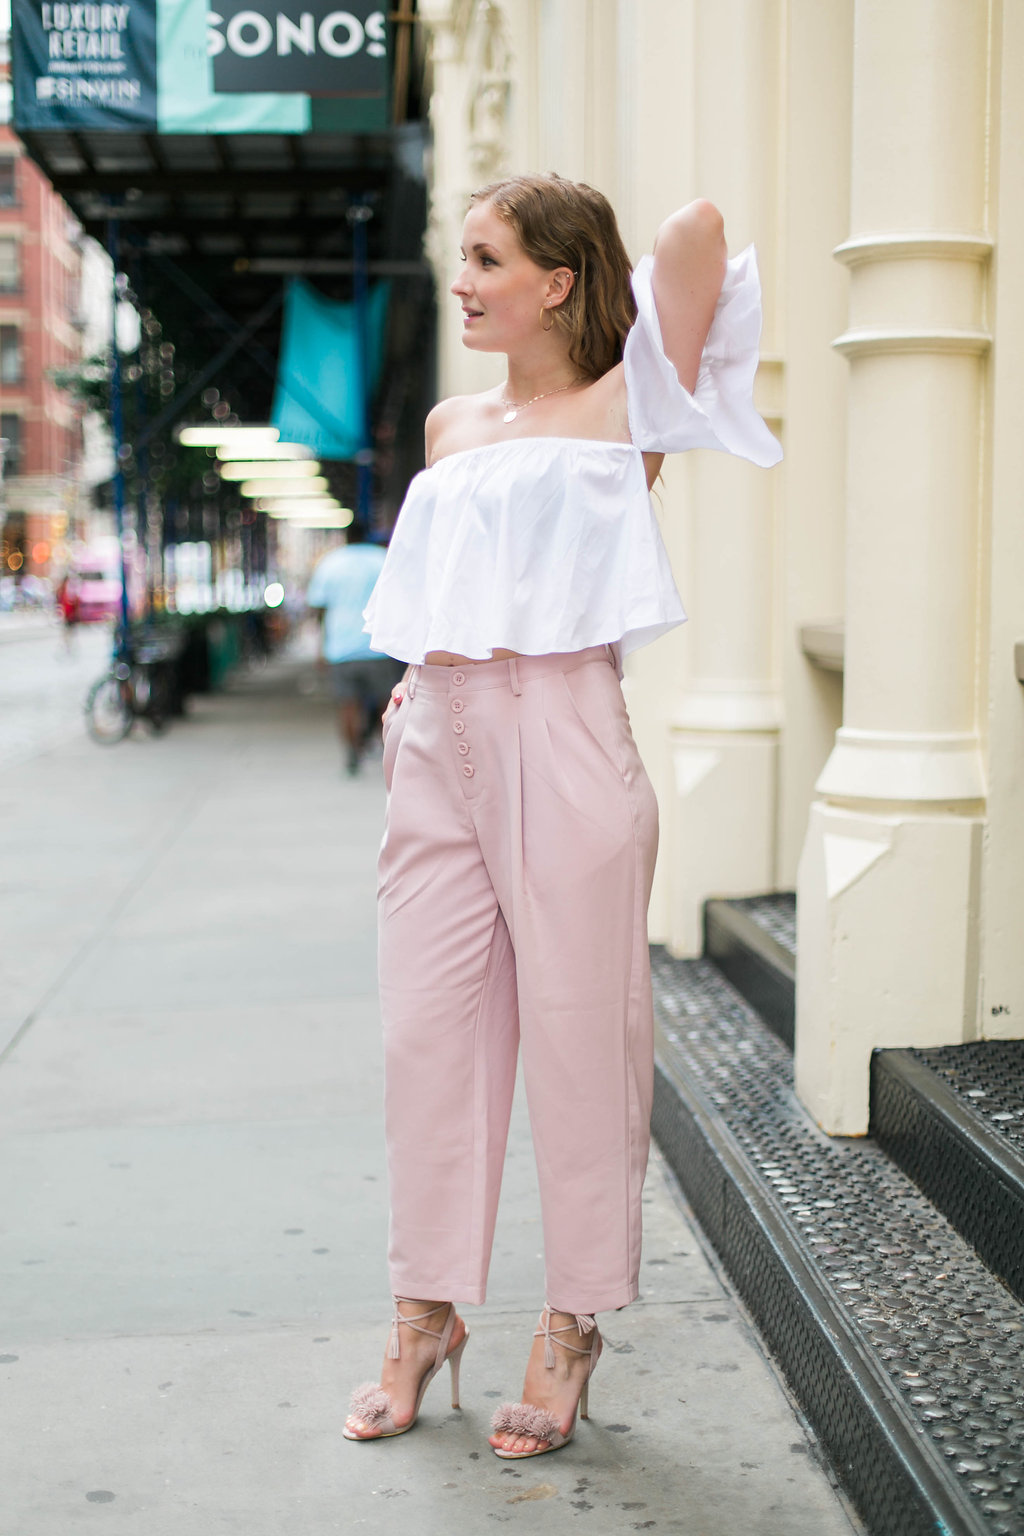 Pink tassel high heels